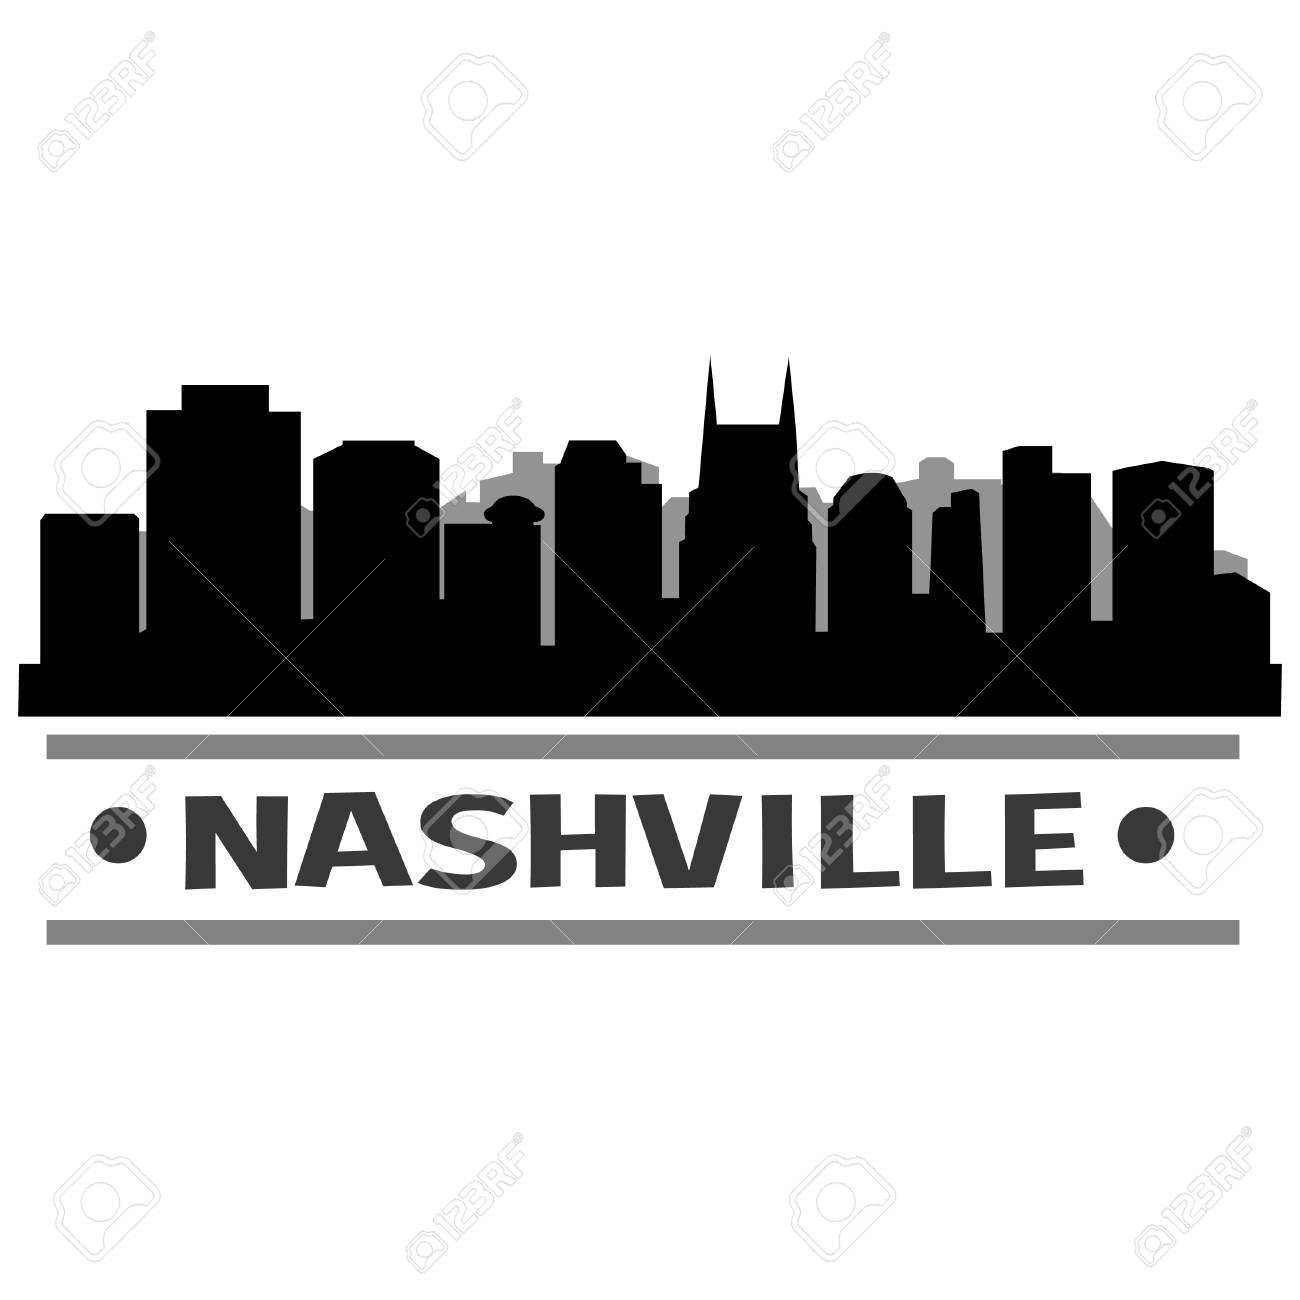 Nashville Skyline Vector Art City Design.